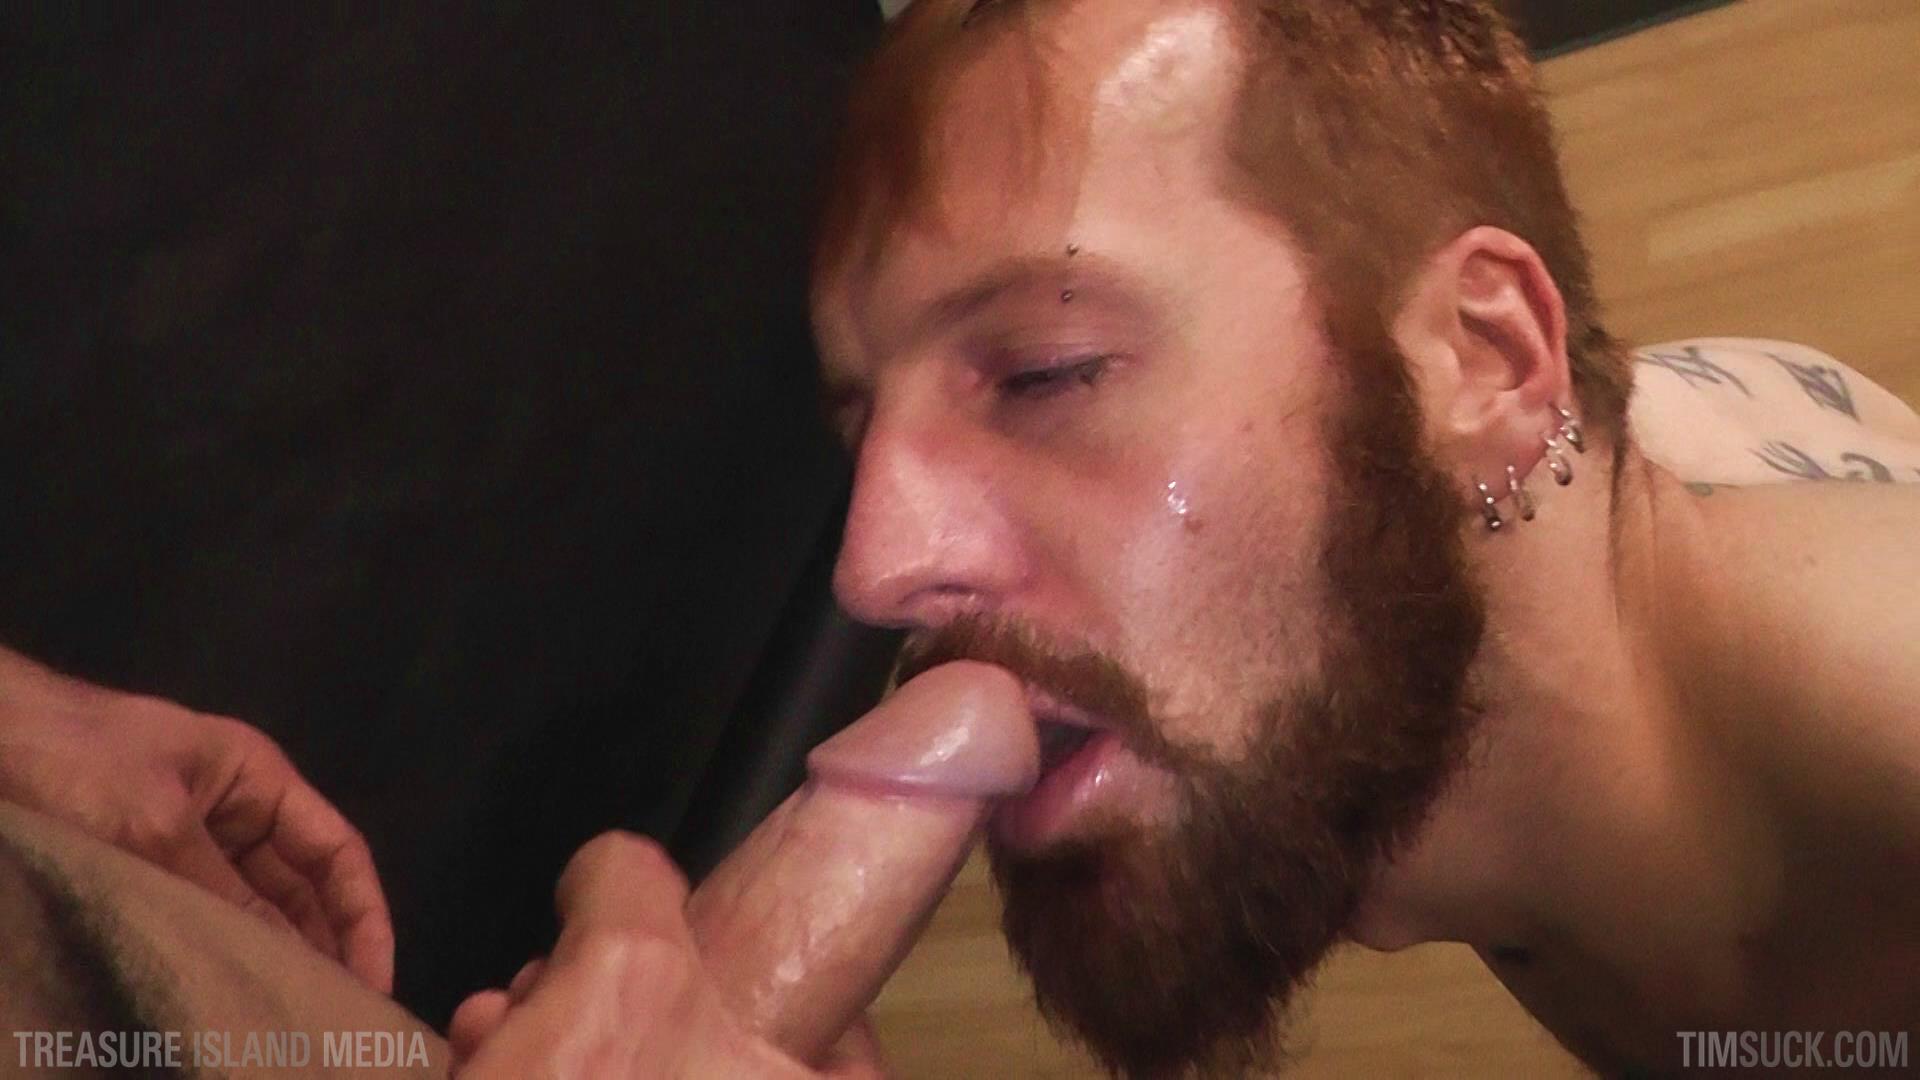 Dick dean st louis pussy